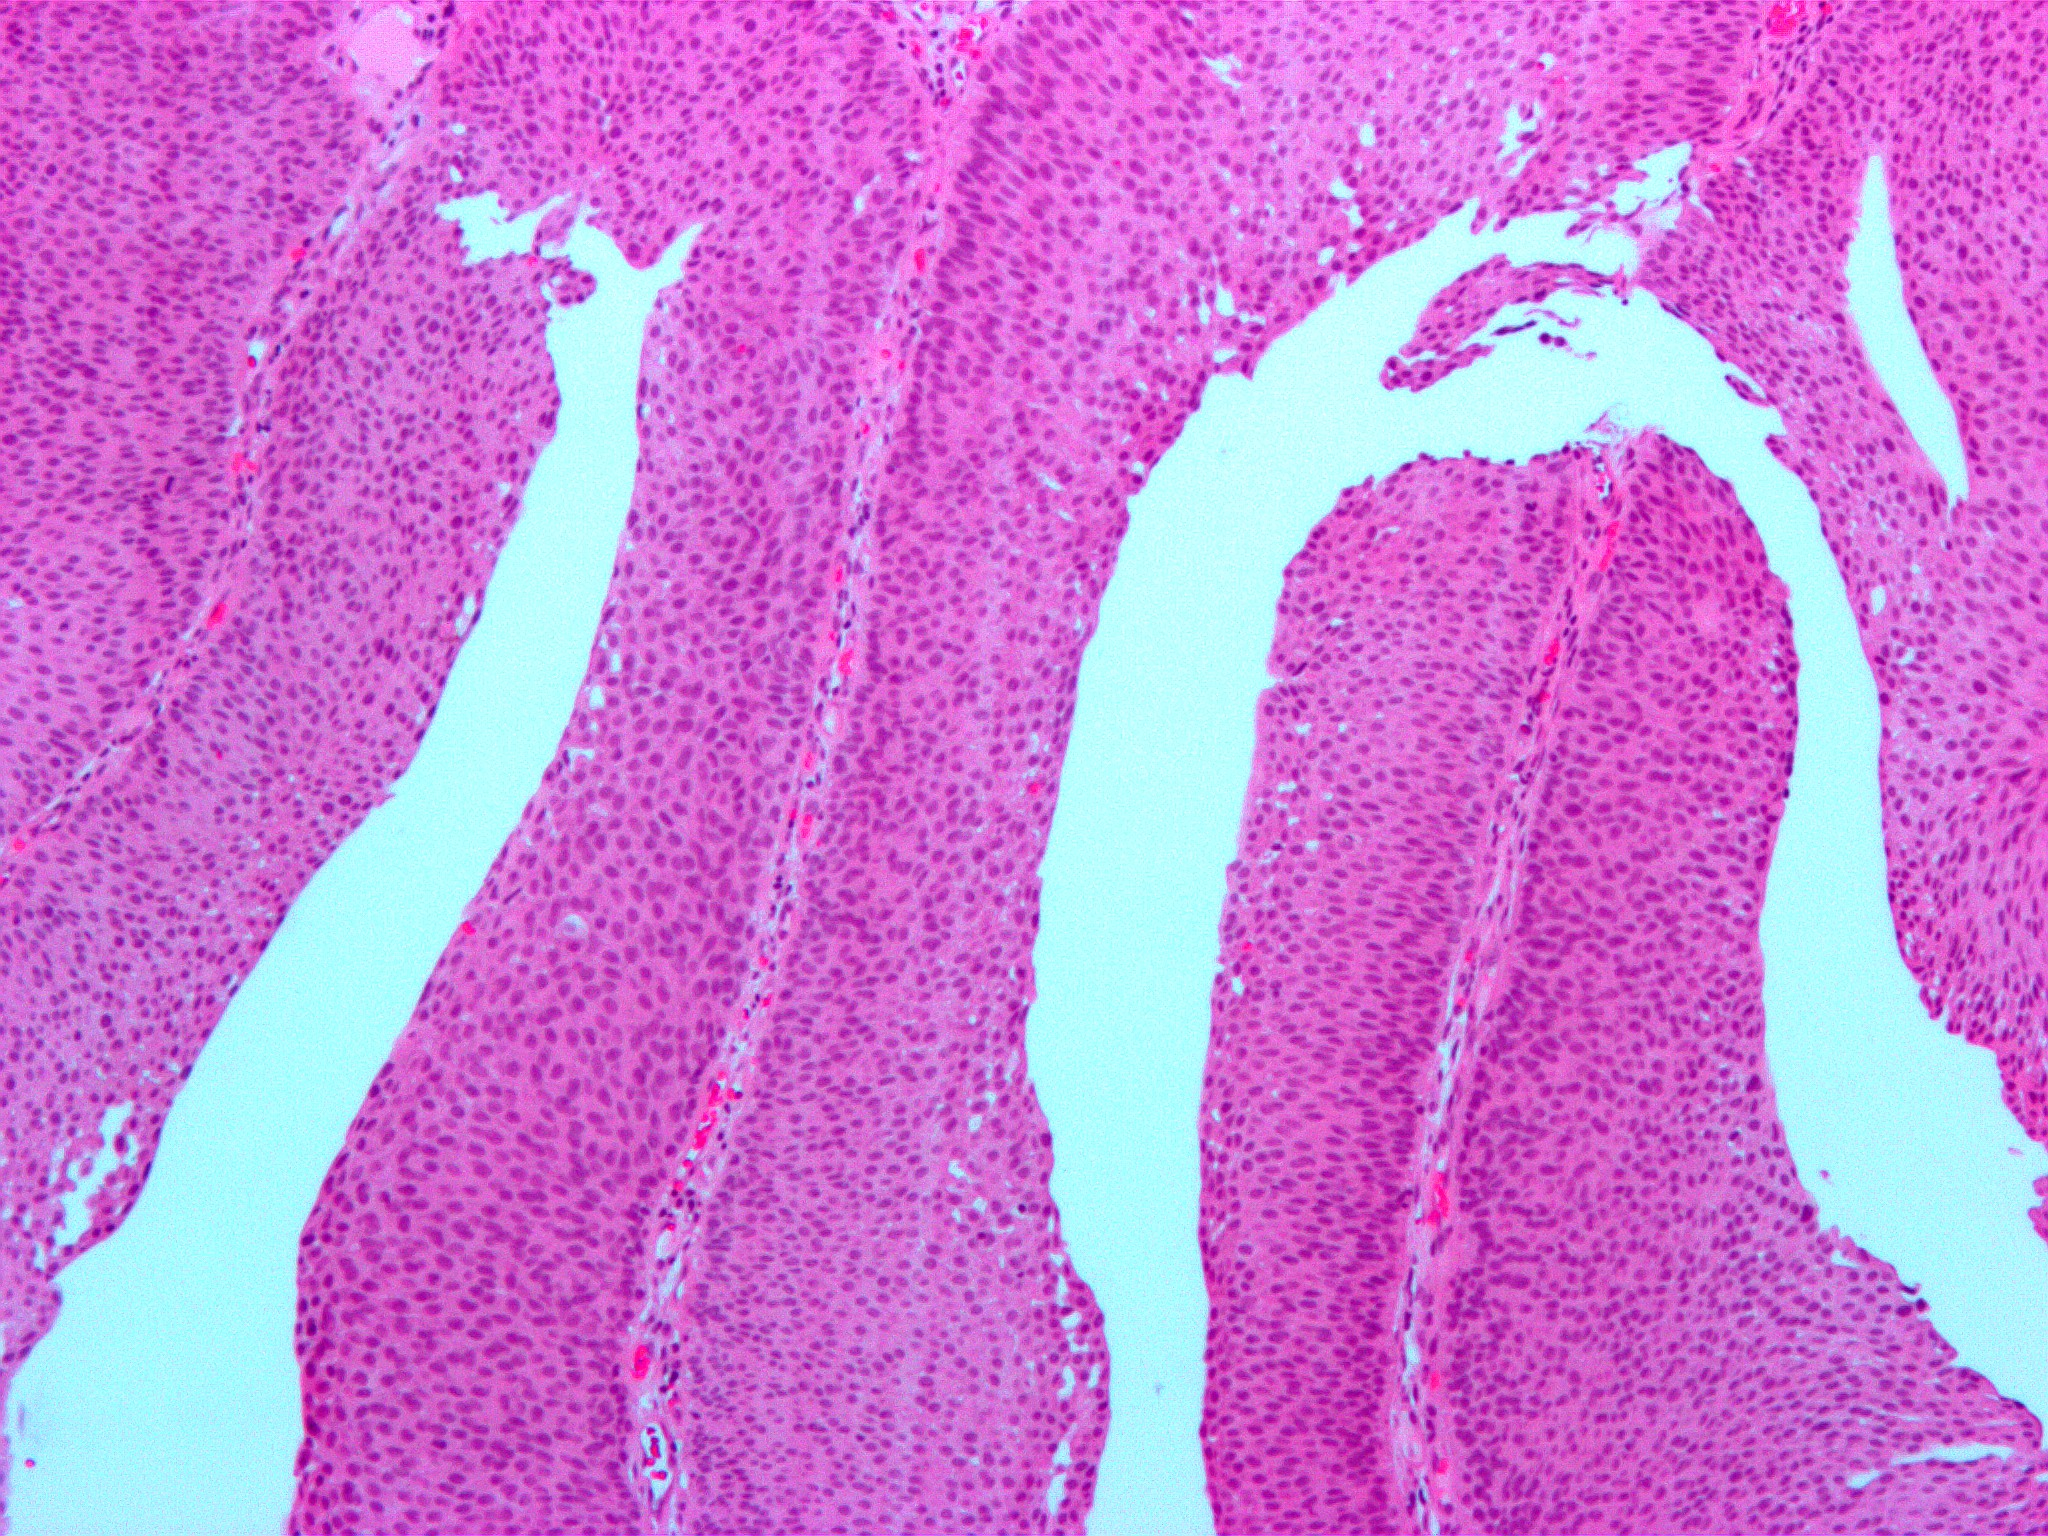 Tumorile vezicale 2011